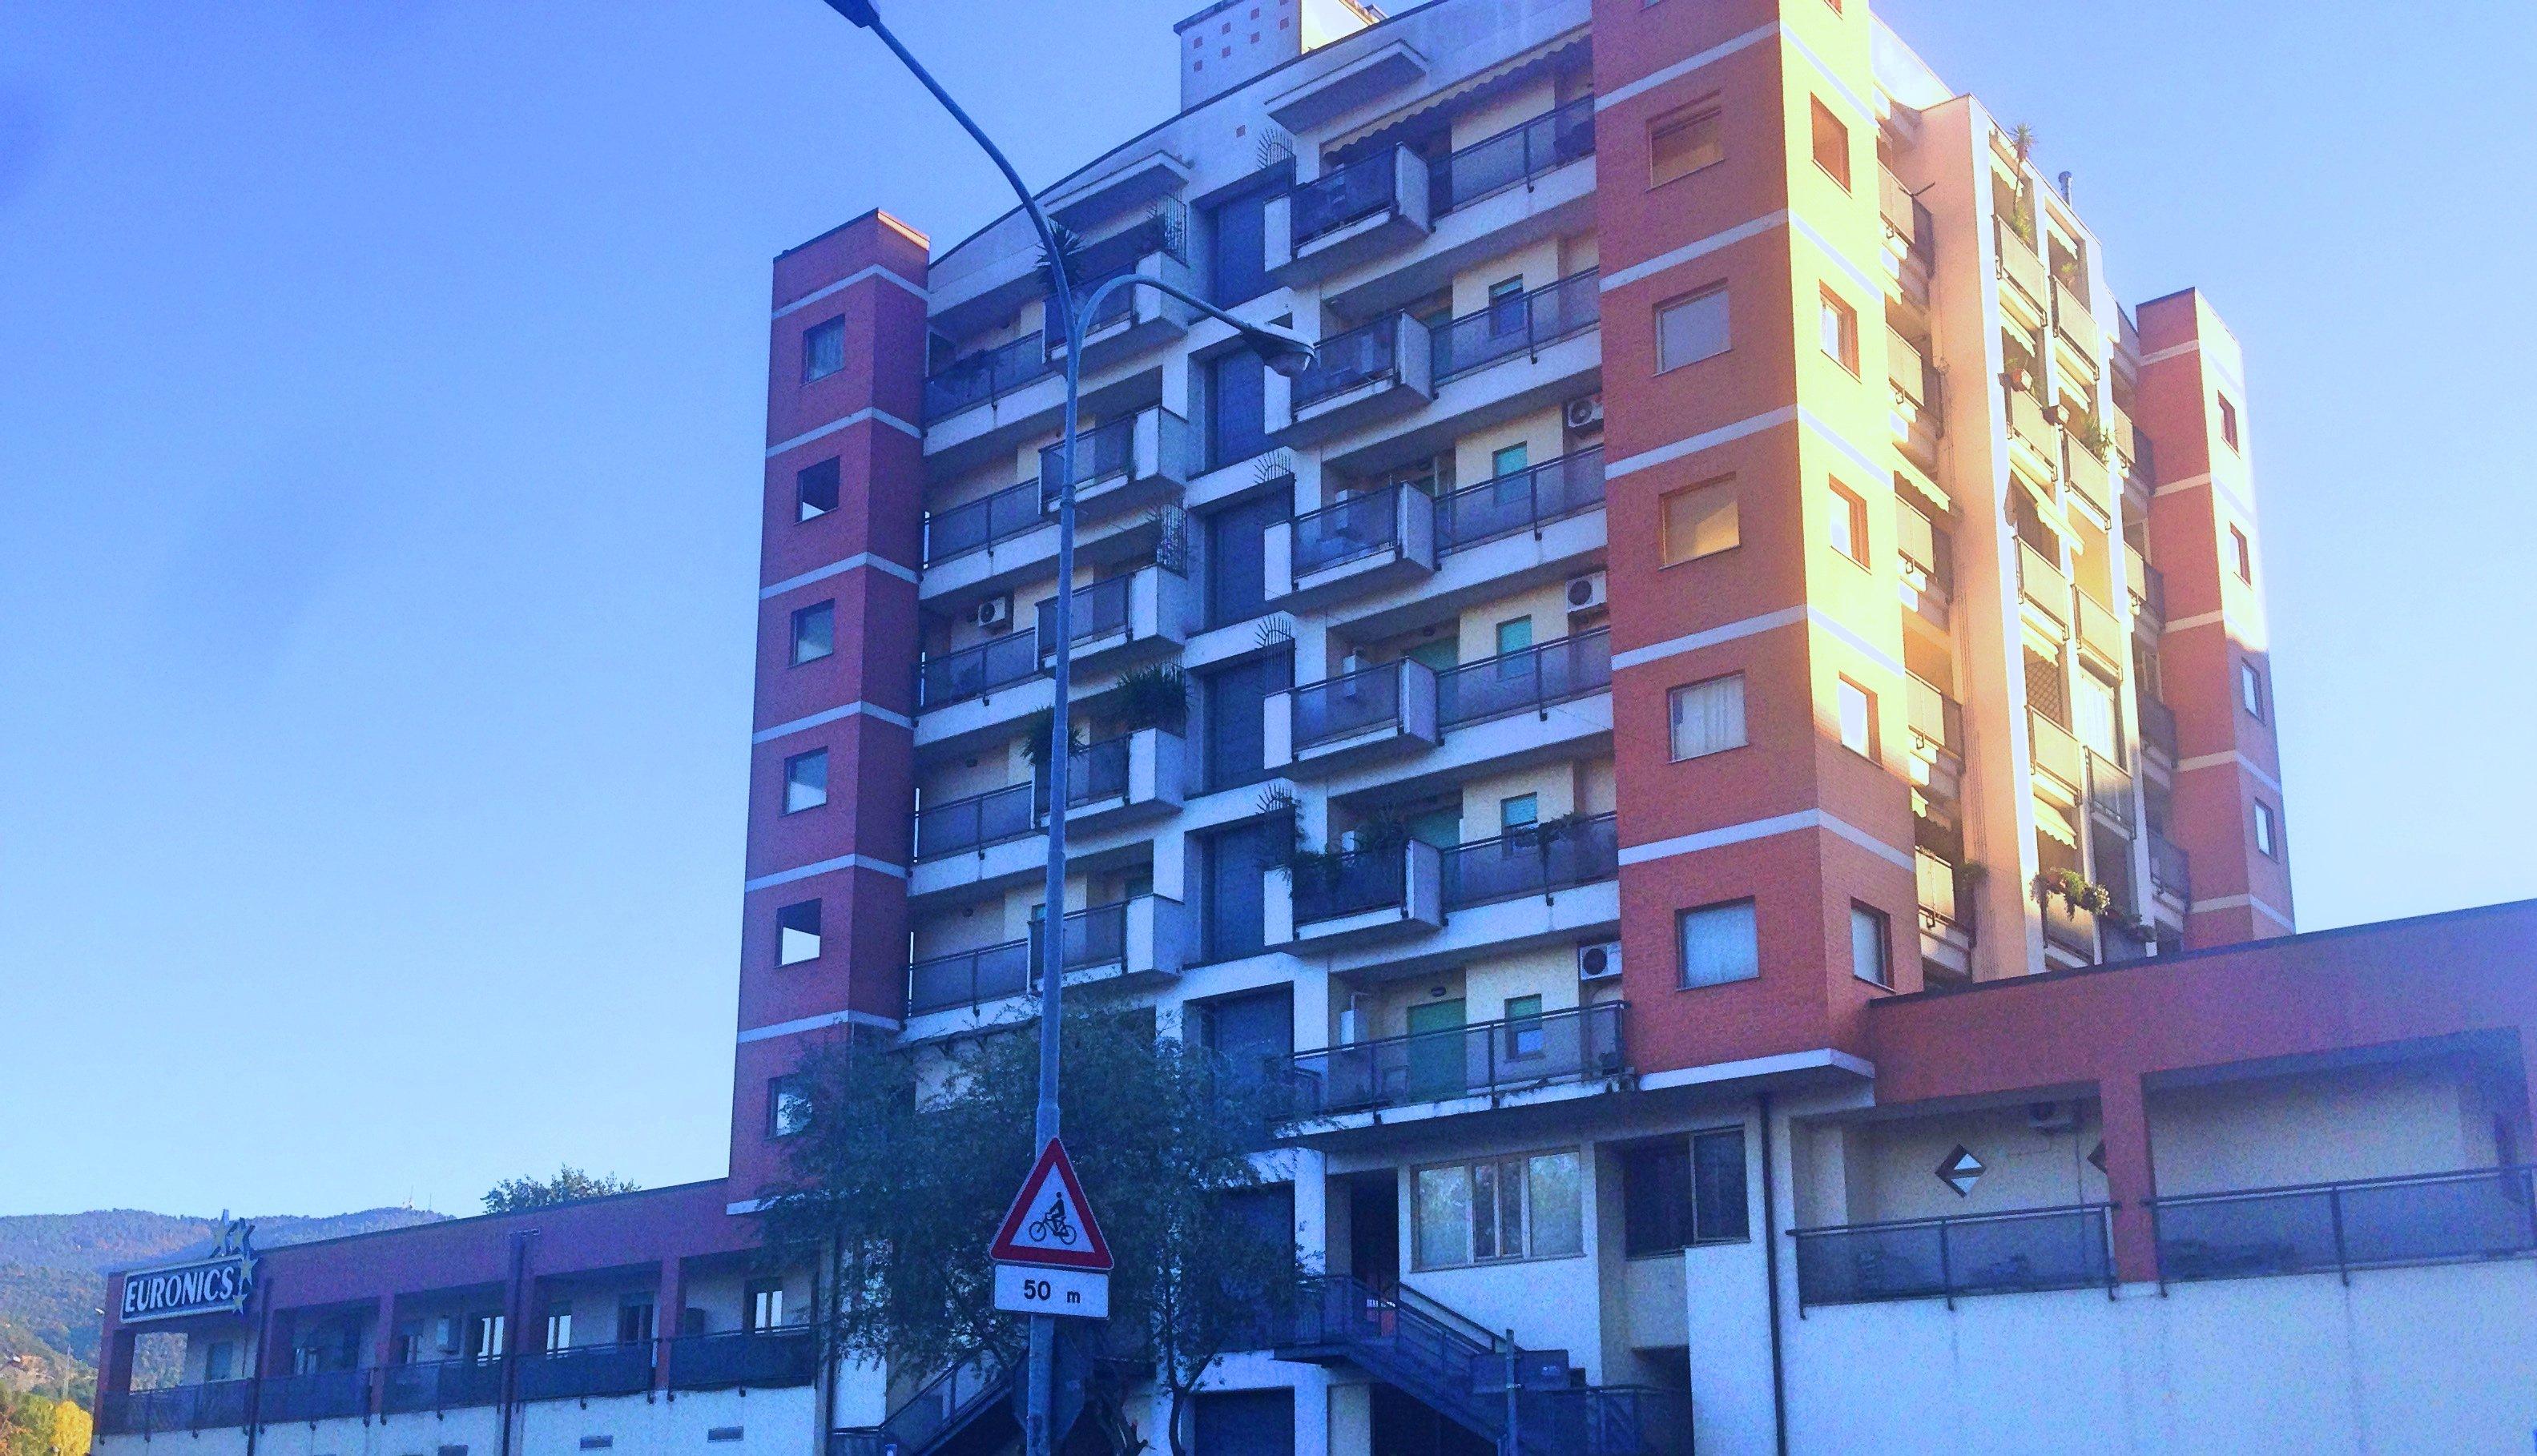 Palazzina adiacente Euronics, Terni